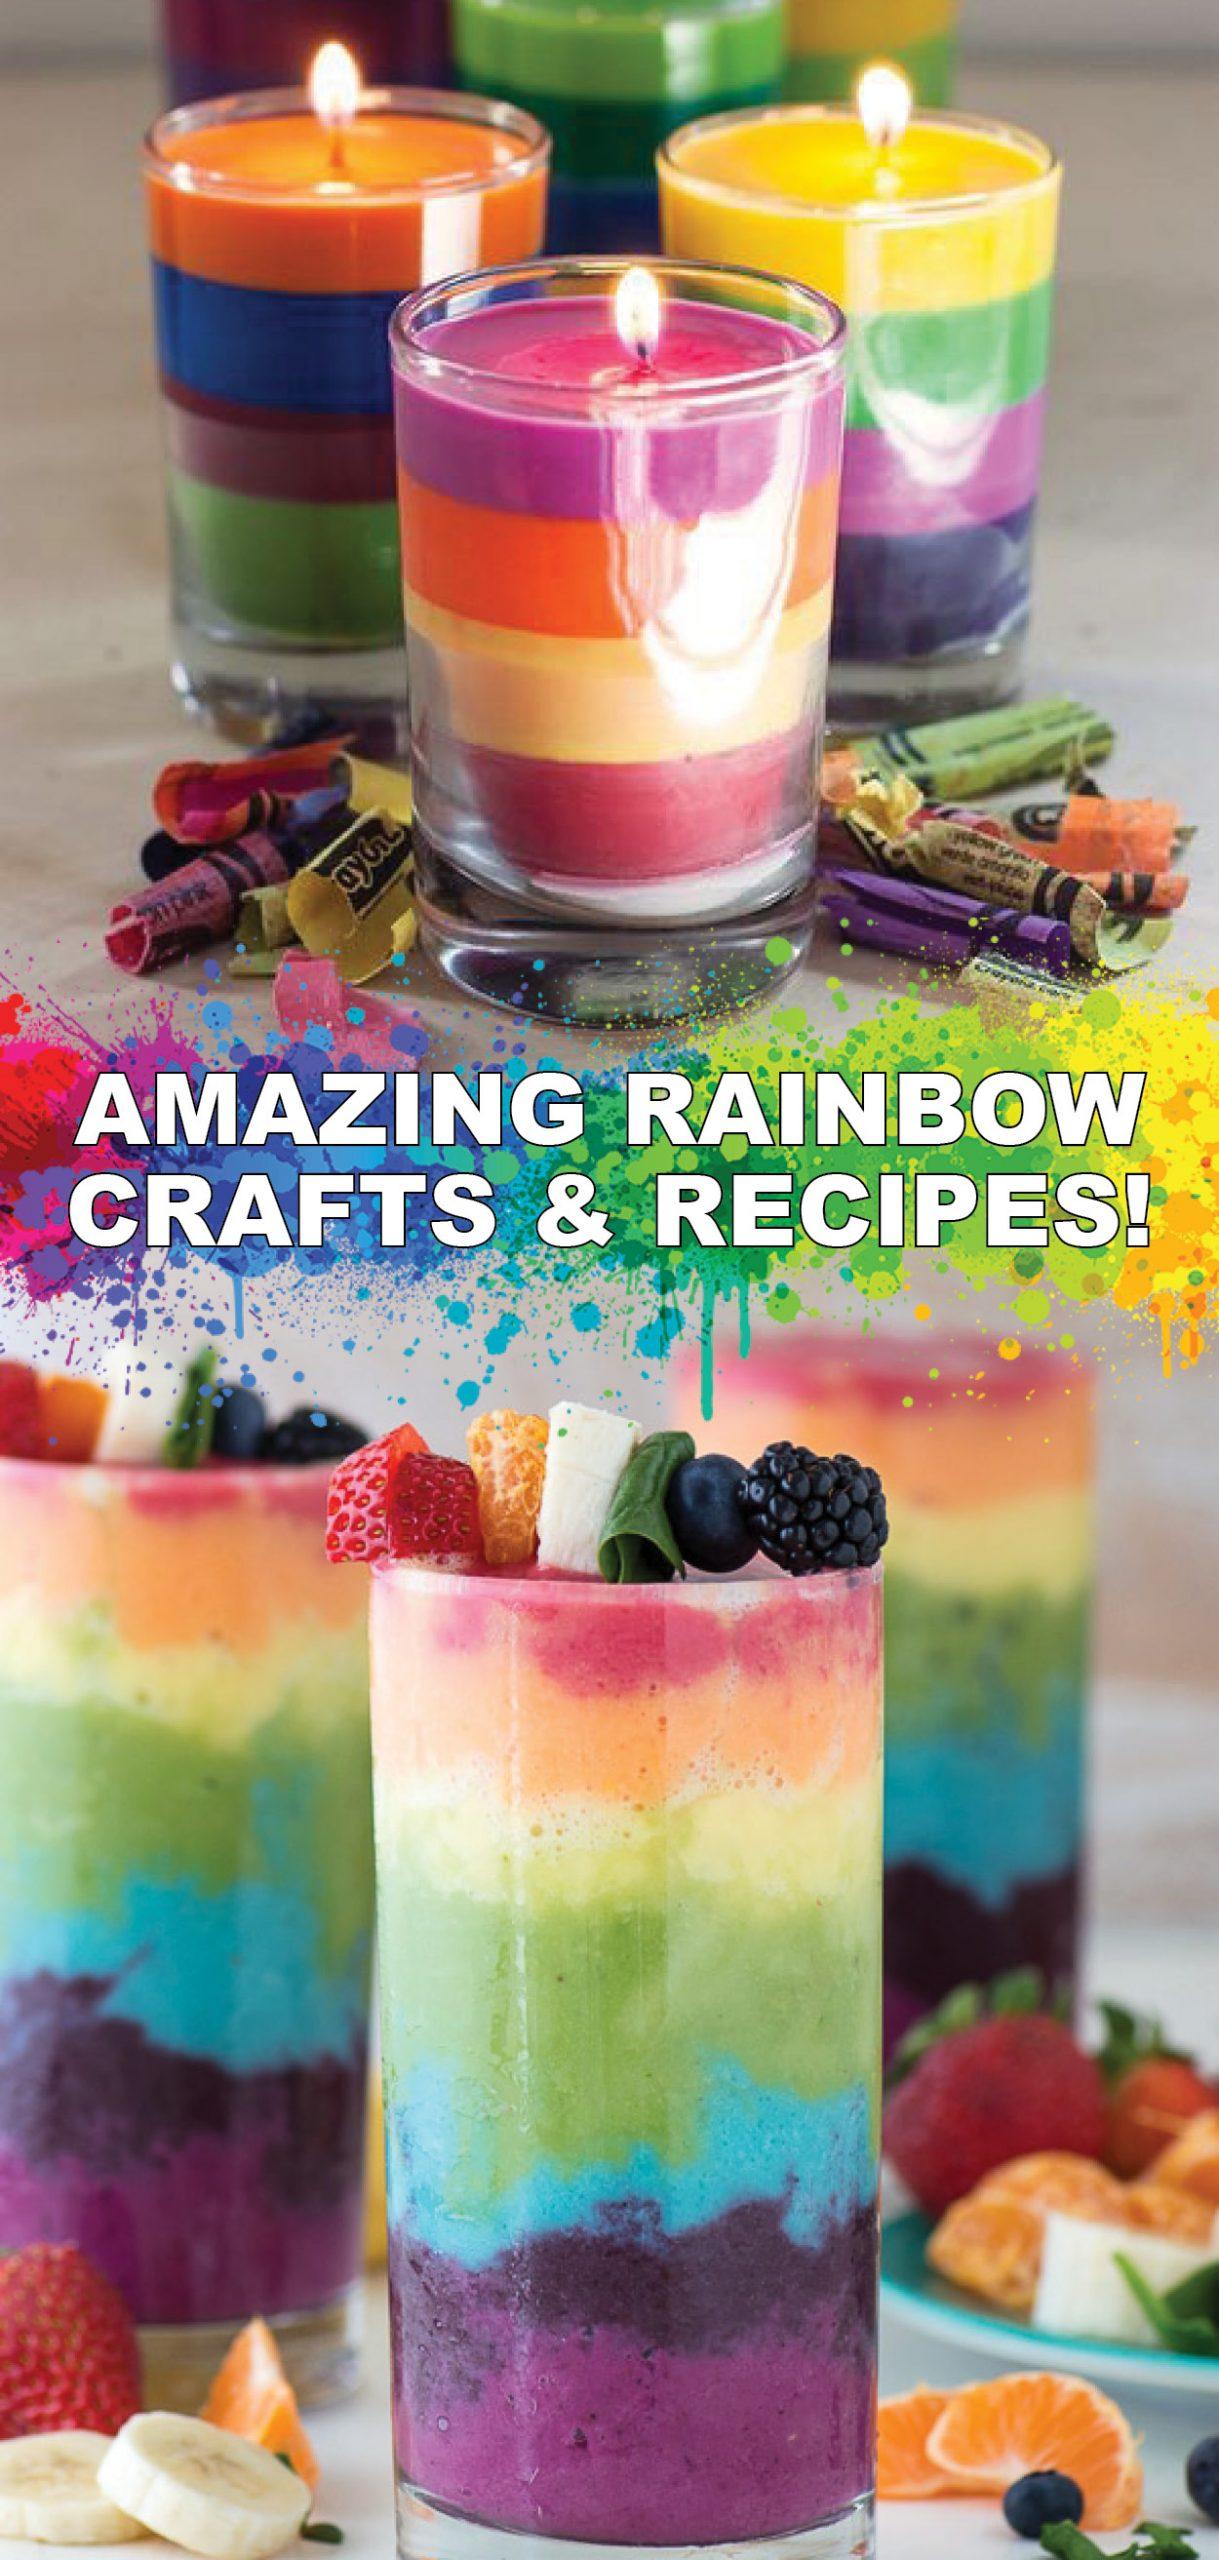 Rainbow Crafts and Recipes